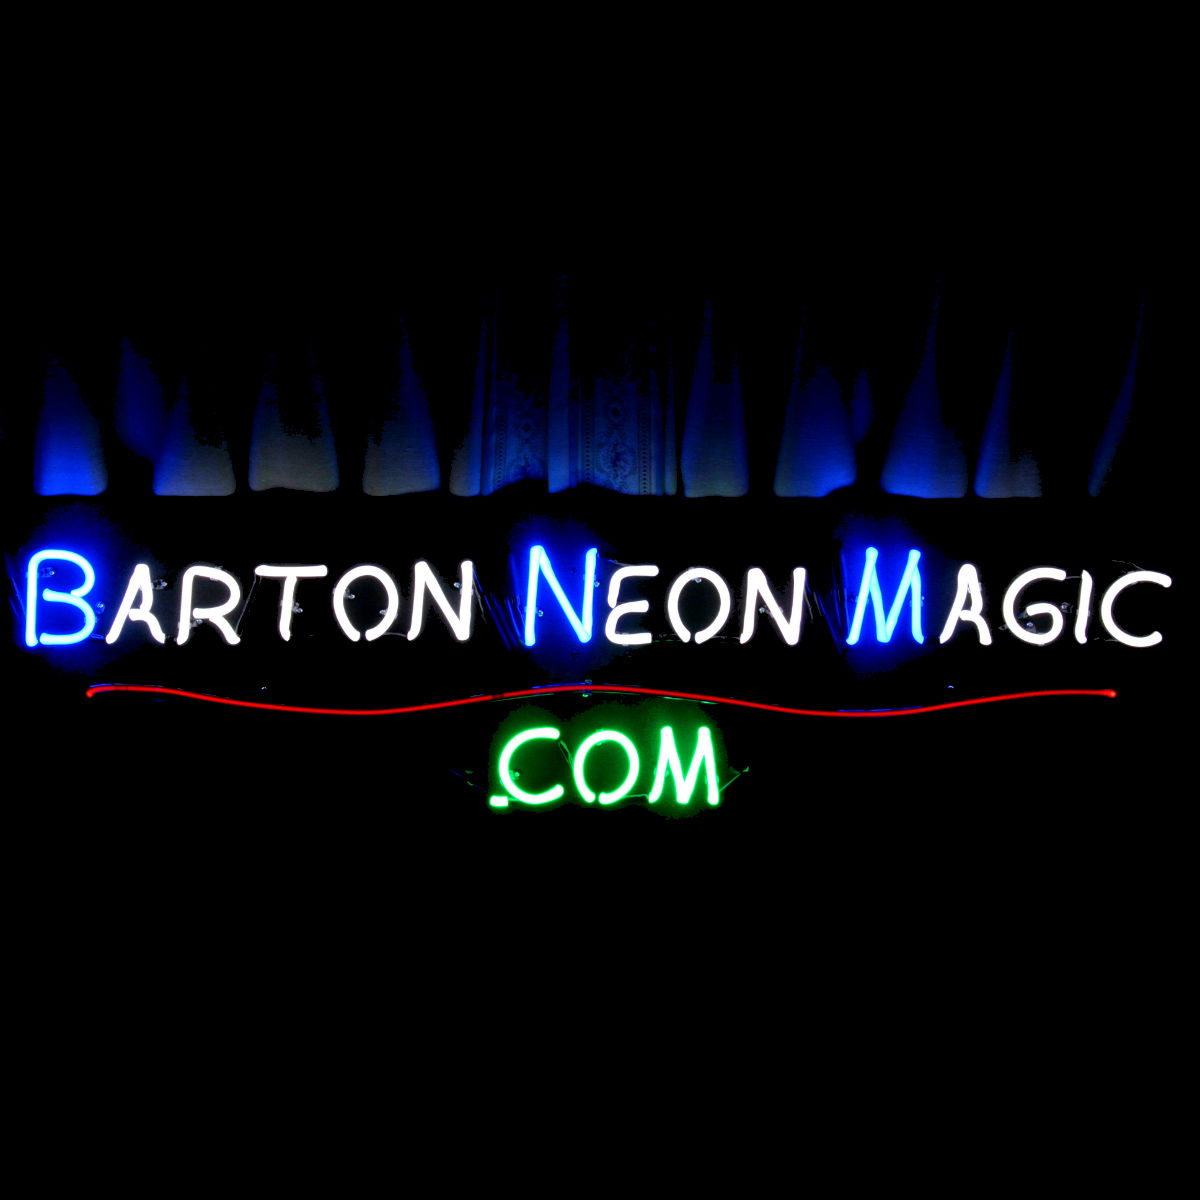 Beautiful custom neon by Famous American Neon Light Sculptor - John Barton